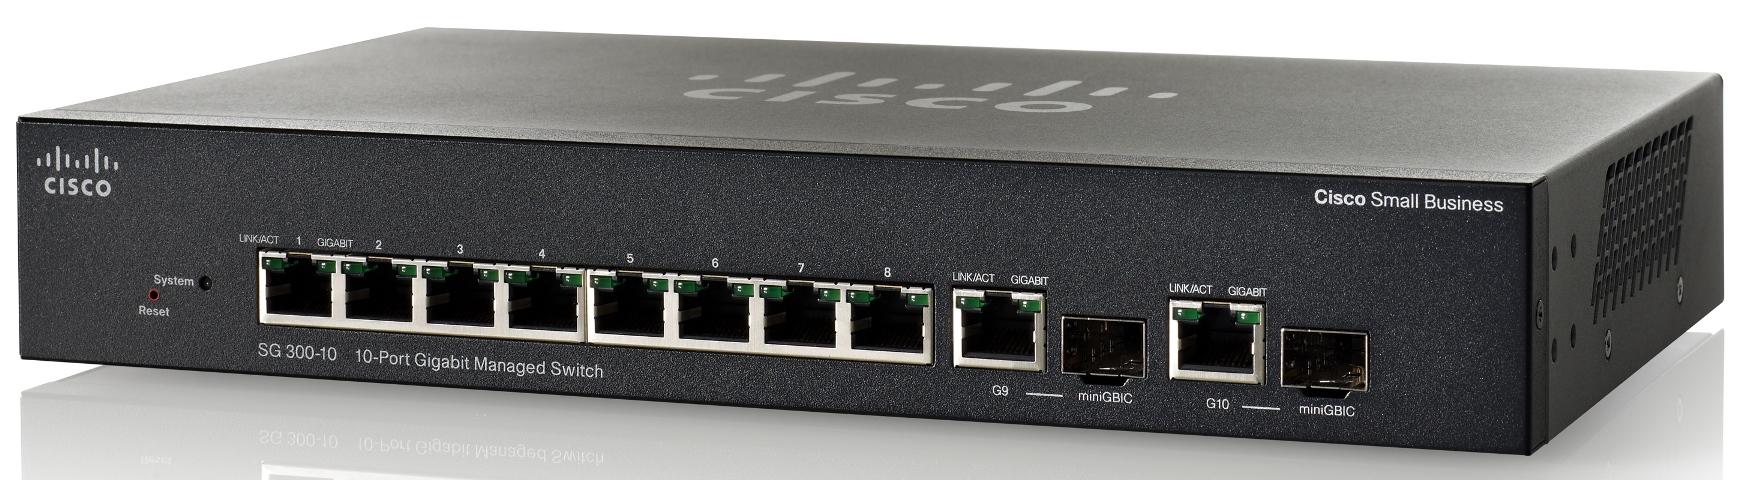 Cisco SG300-10 10-port Gigabit Managed Switch